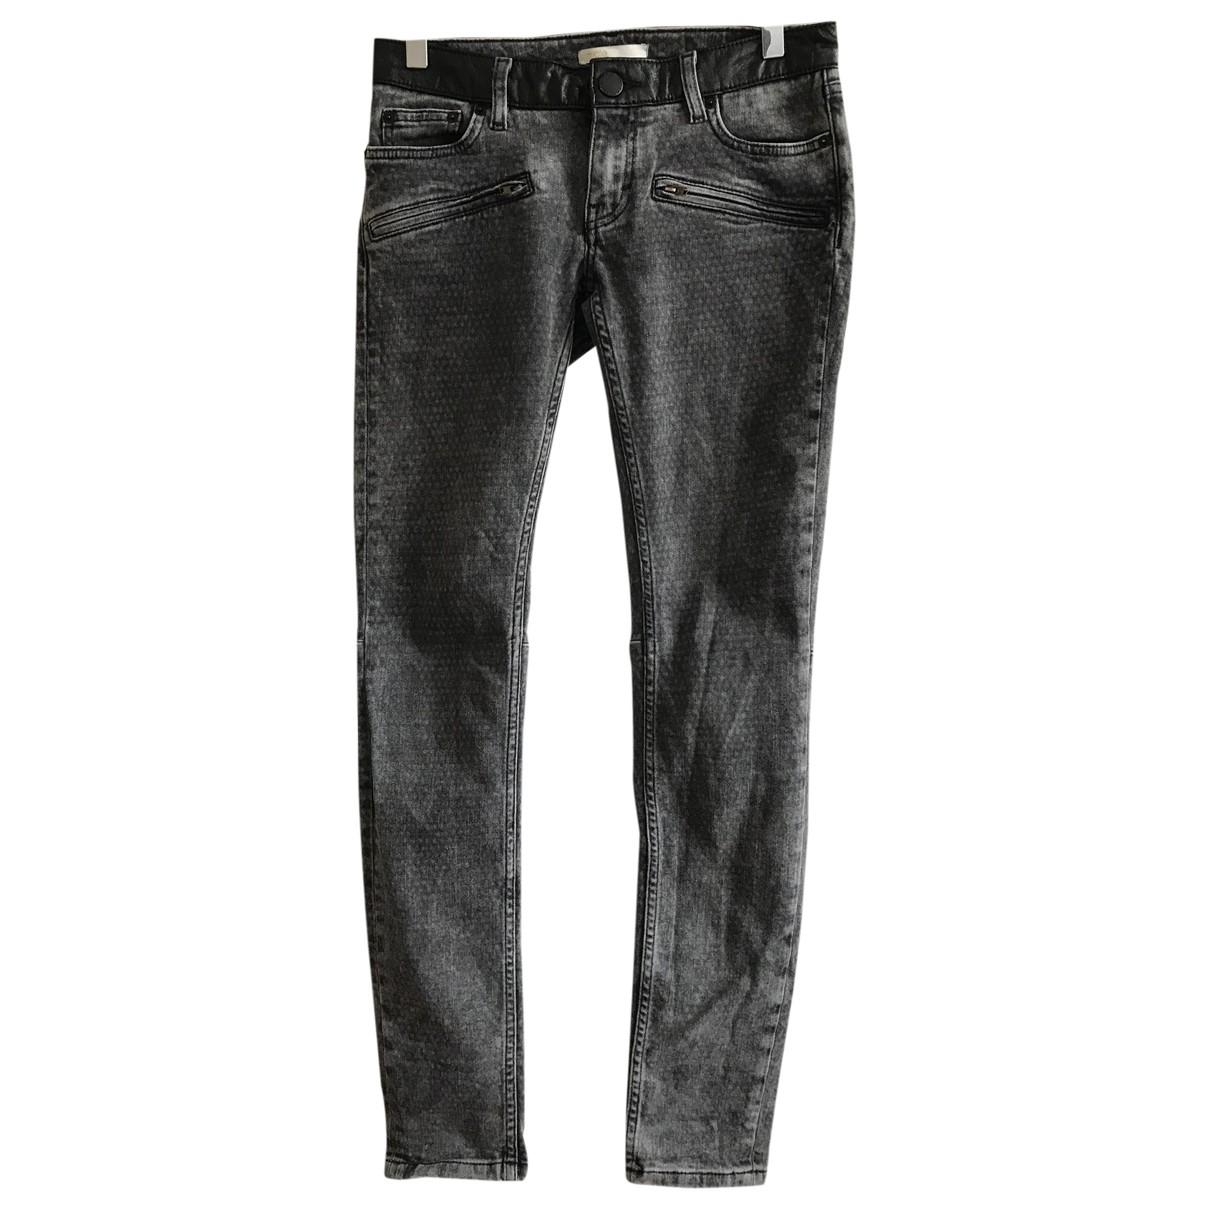 Maje \N Grey Cotton - elasthane Jeans for Women 36 FR